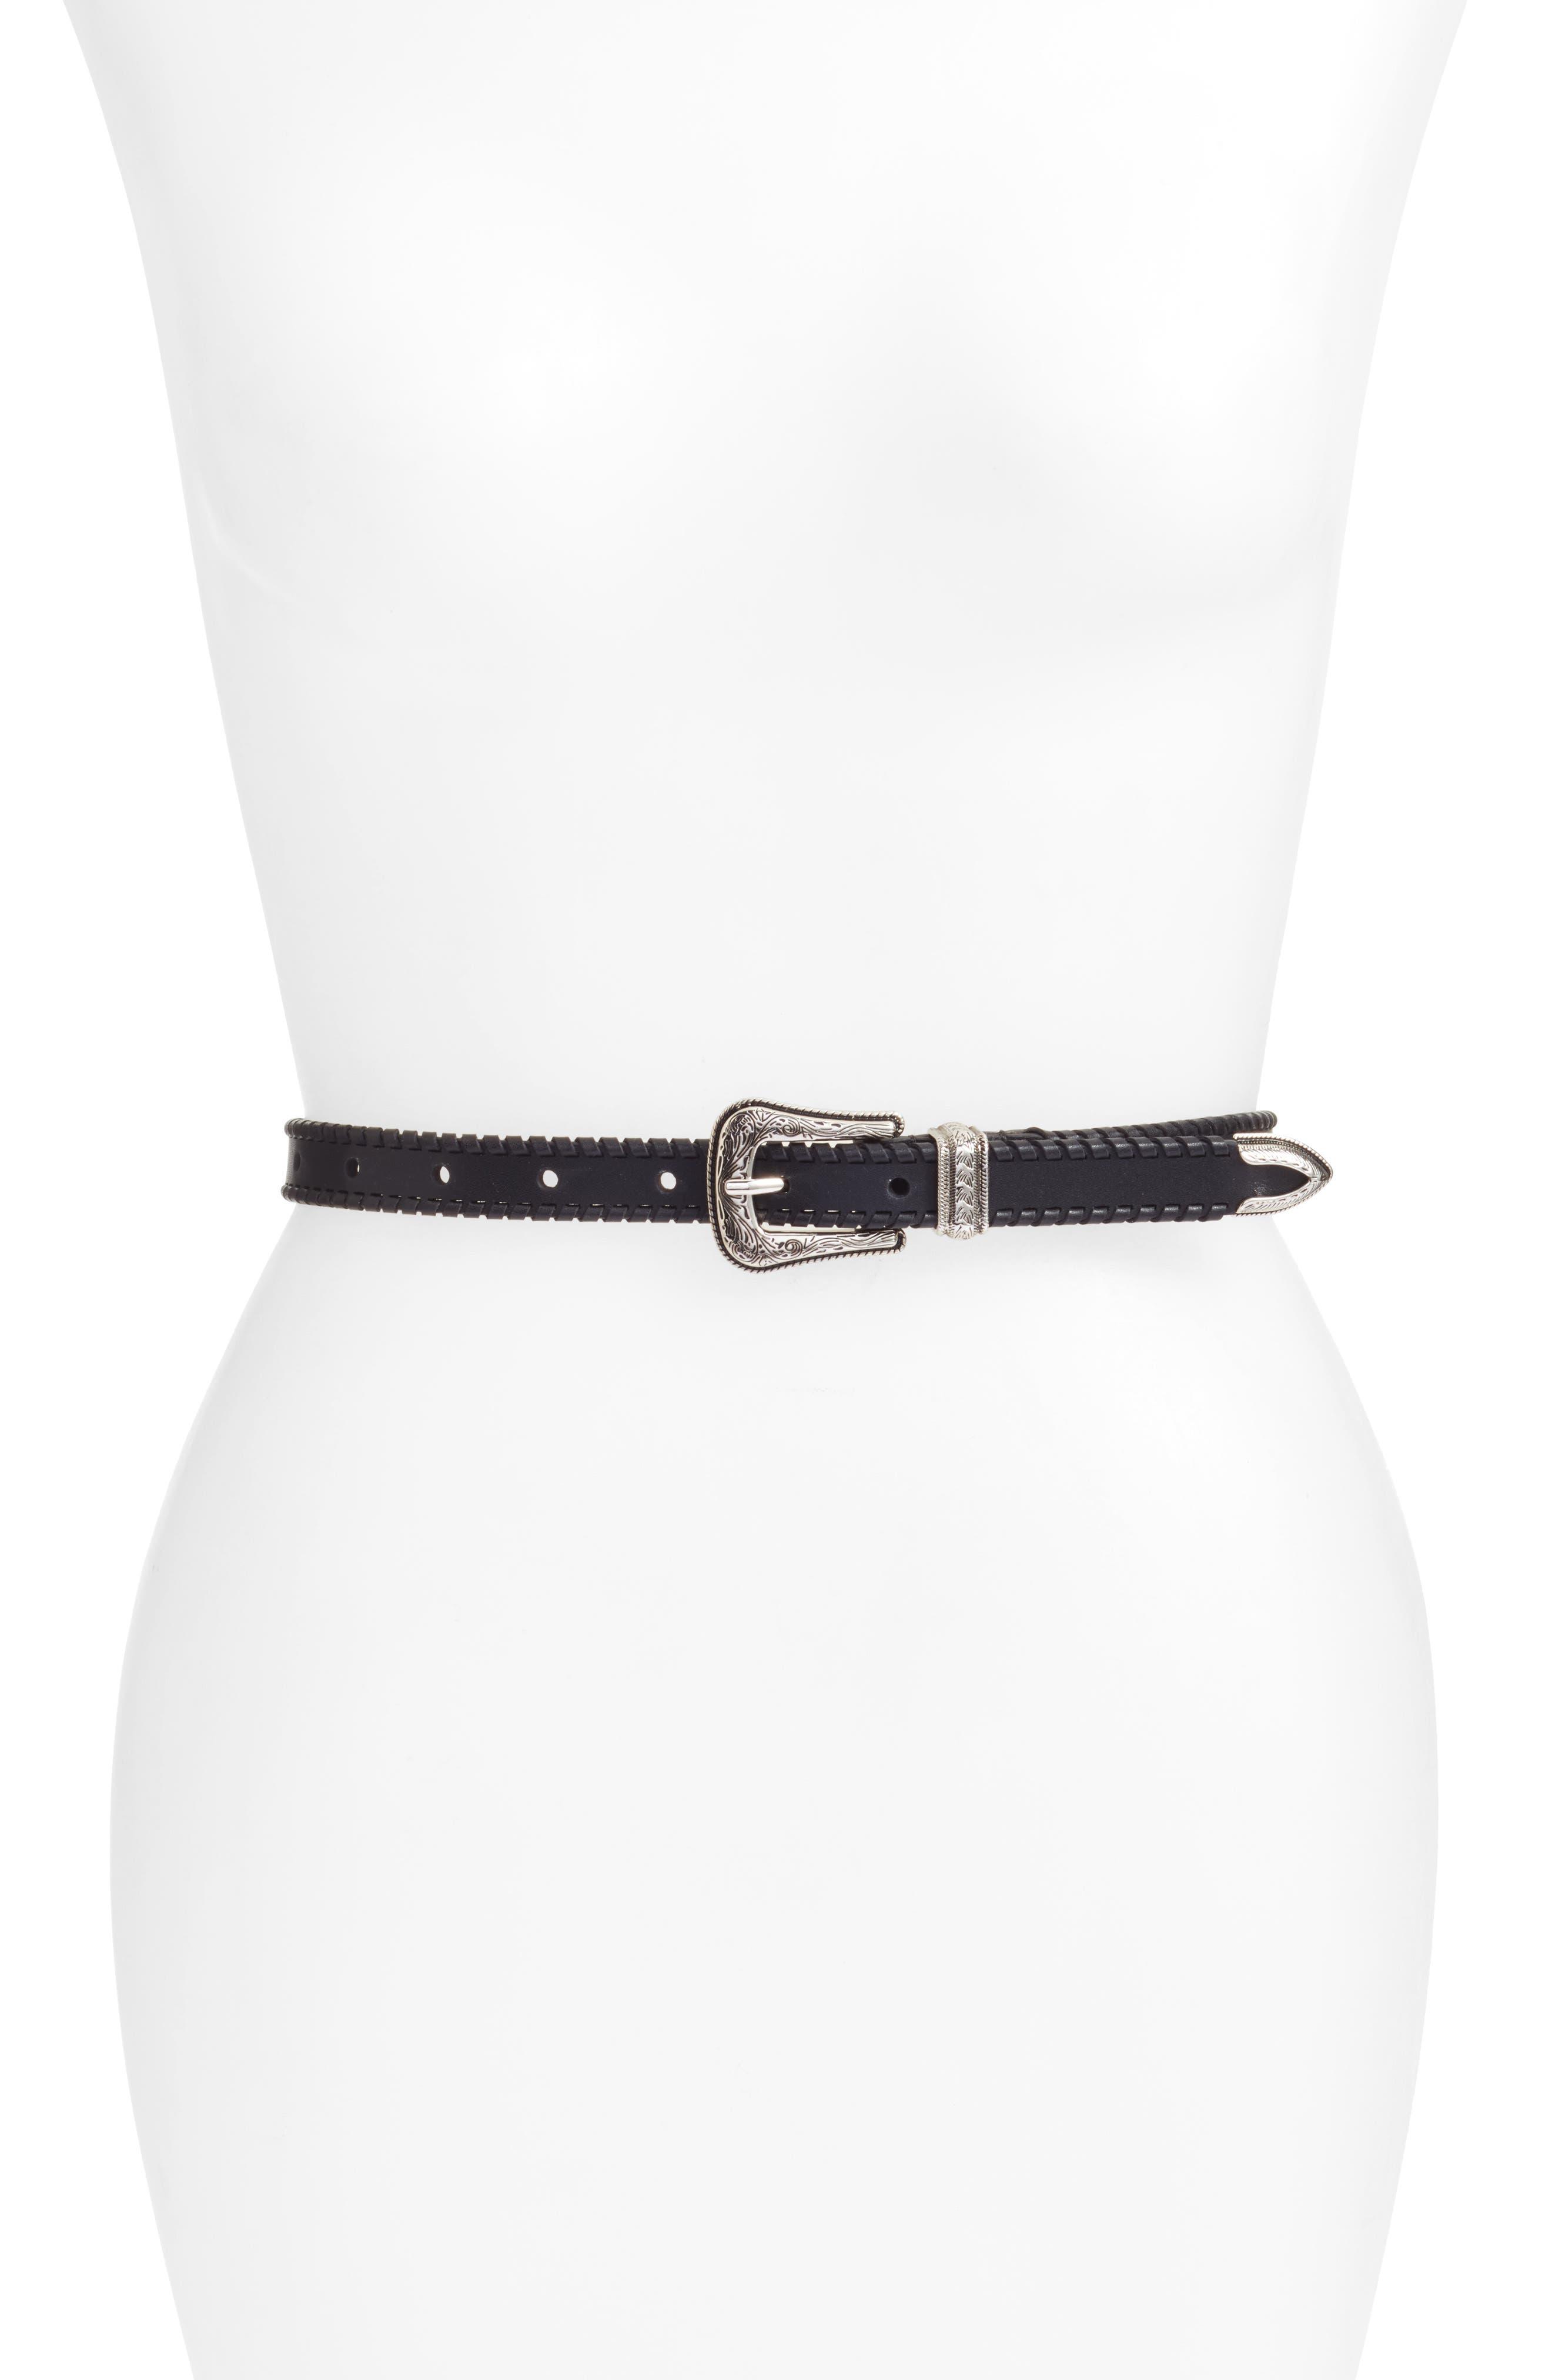 Rebecca Minkoff Whipstitch Leather Belt, Black